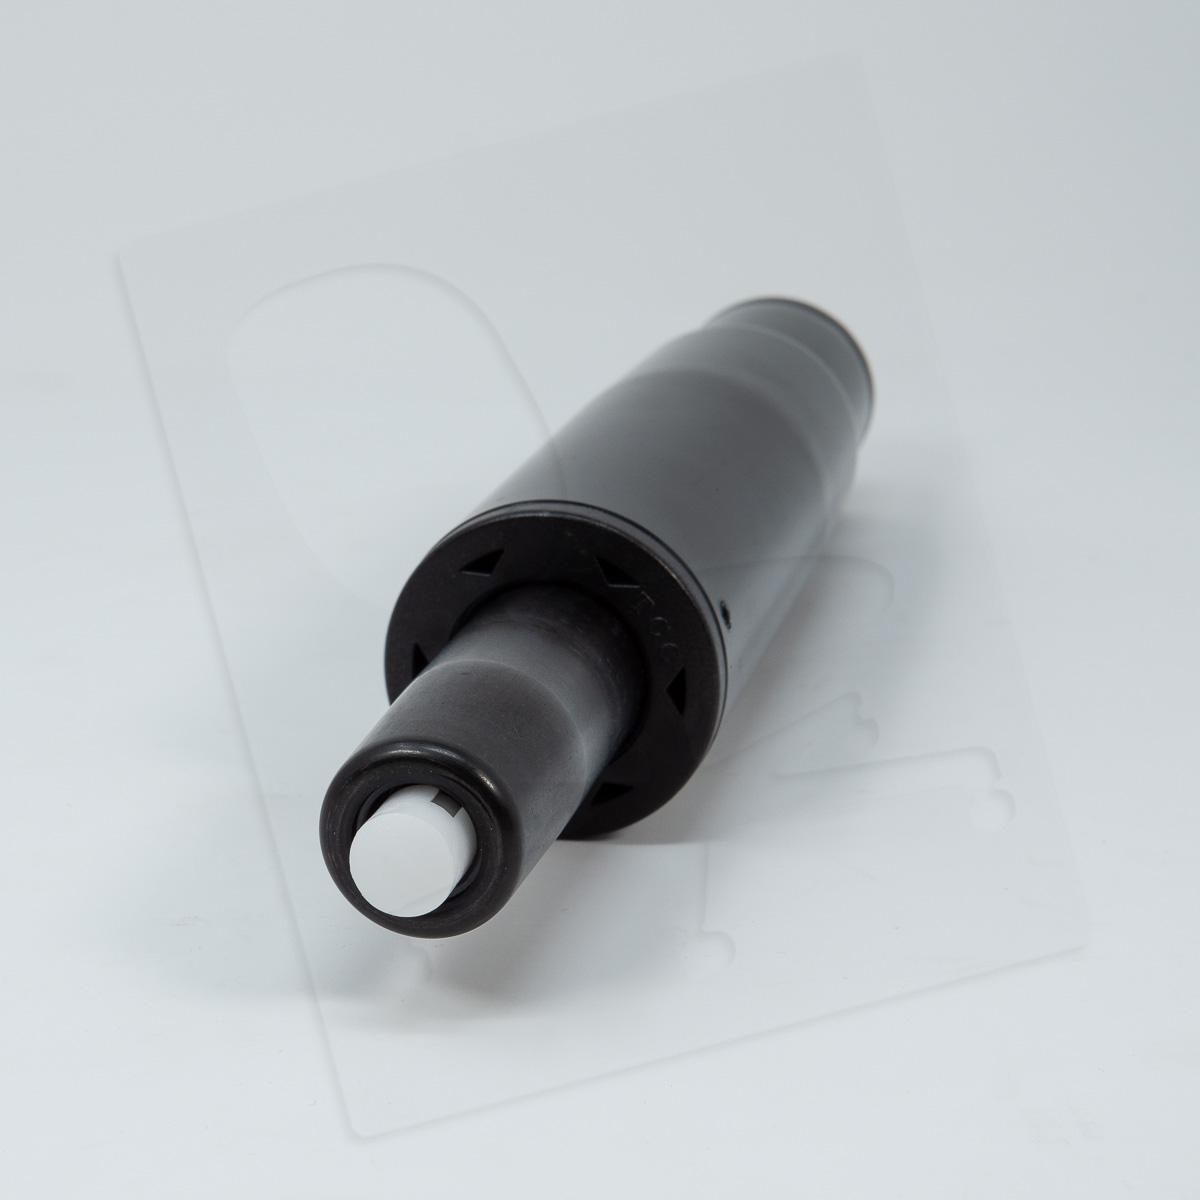 Crandall Office Furniture Aftermarket Haworth Improv (2002-Present) 10 inch Stool Gas Cylinder 0002